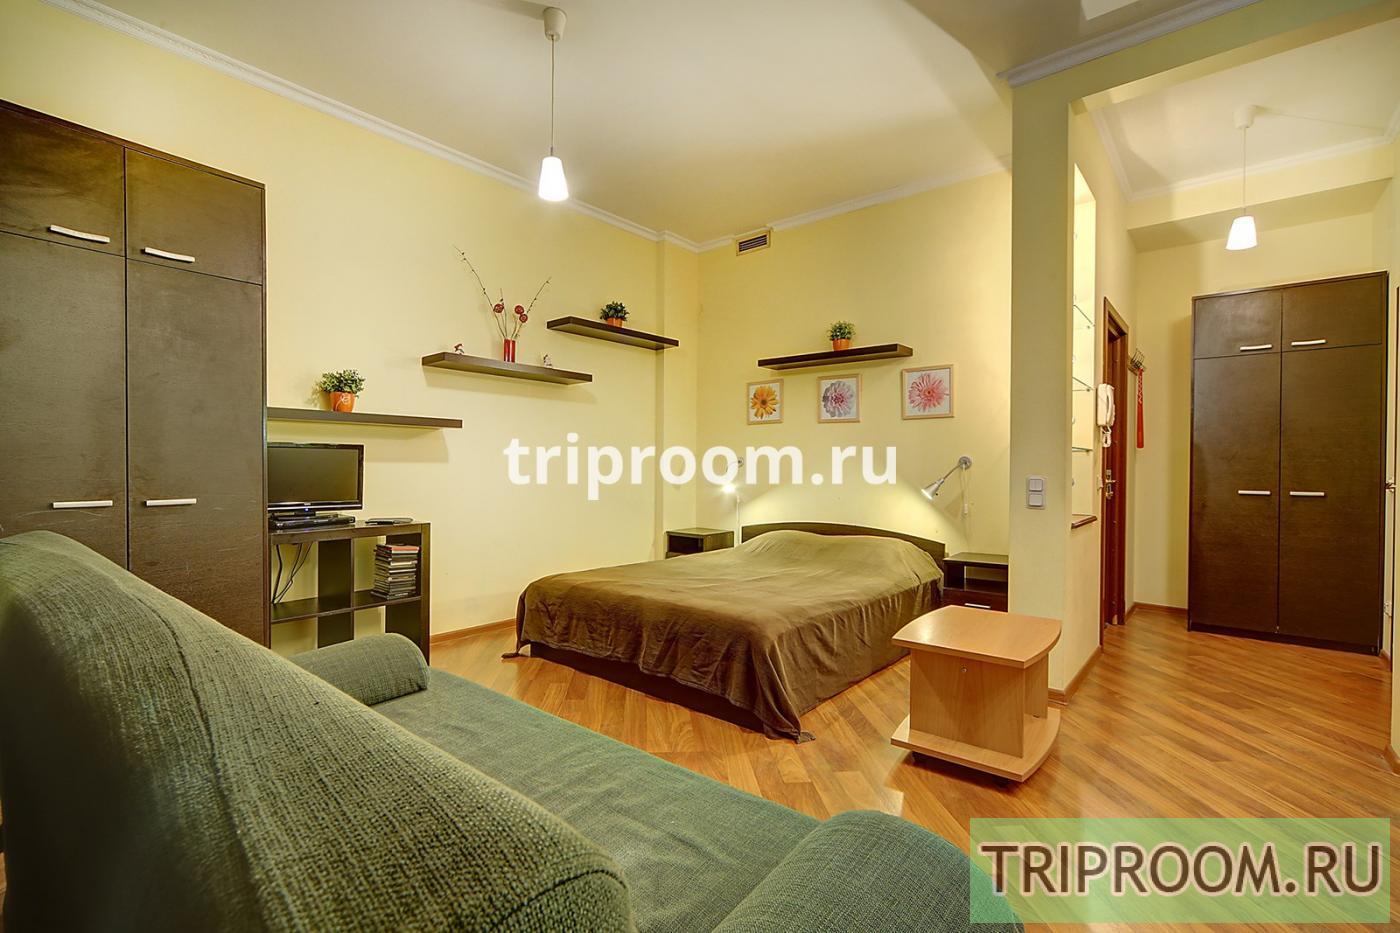 1-комнатная квартира посуточно (вариант № 15117), ул. Канала Грибоедова набережная, фото № 5